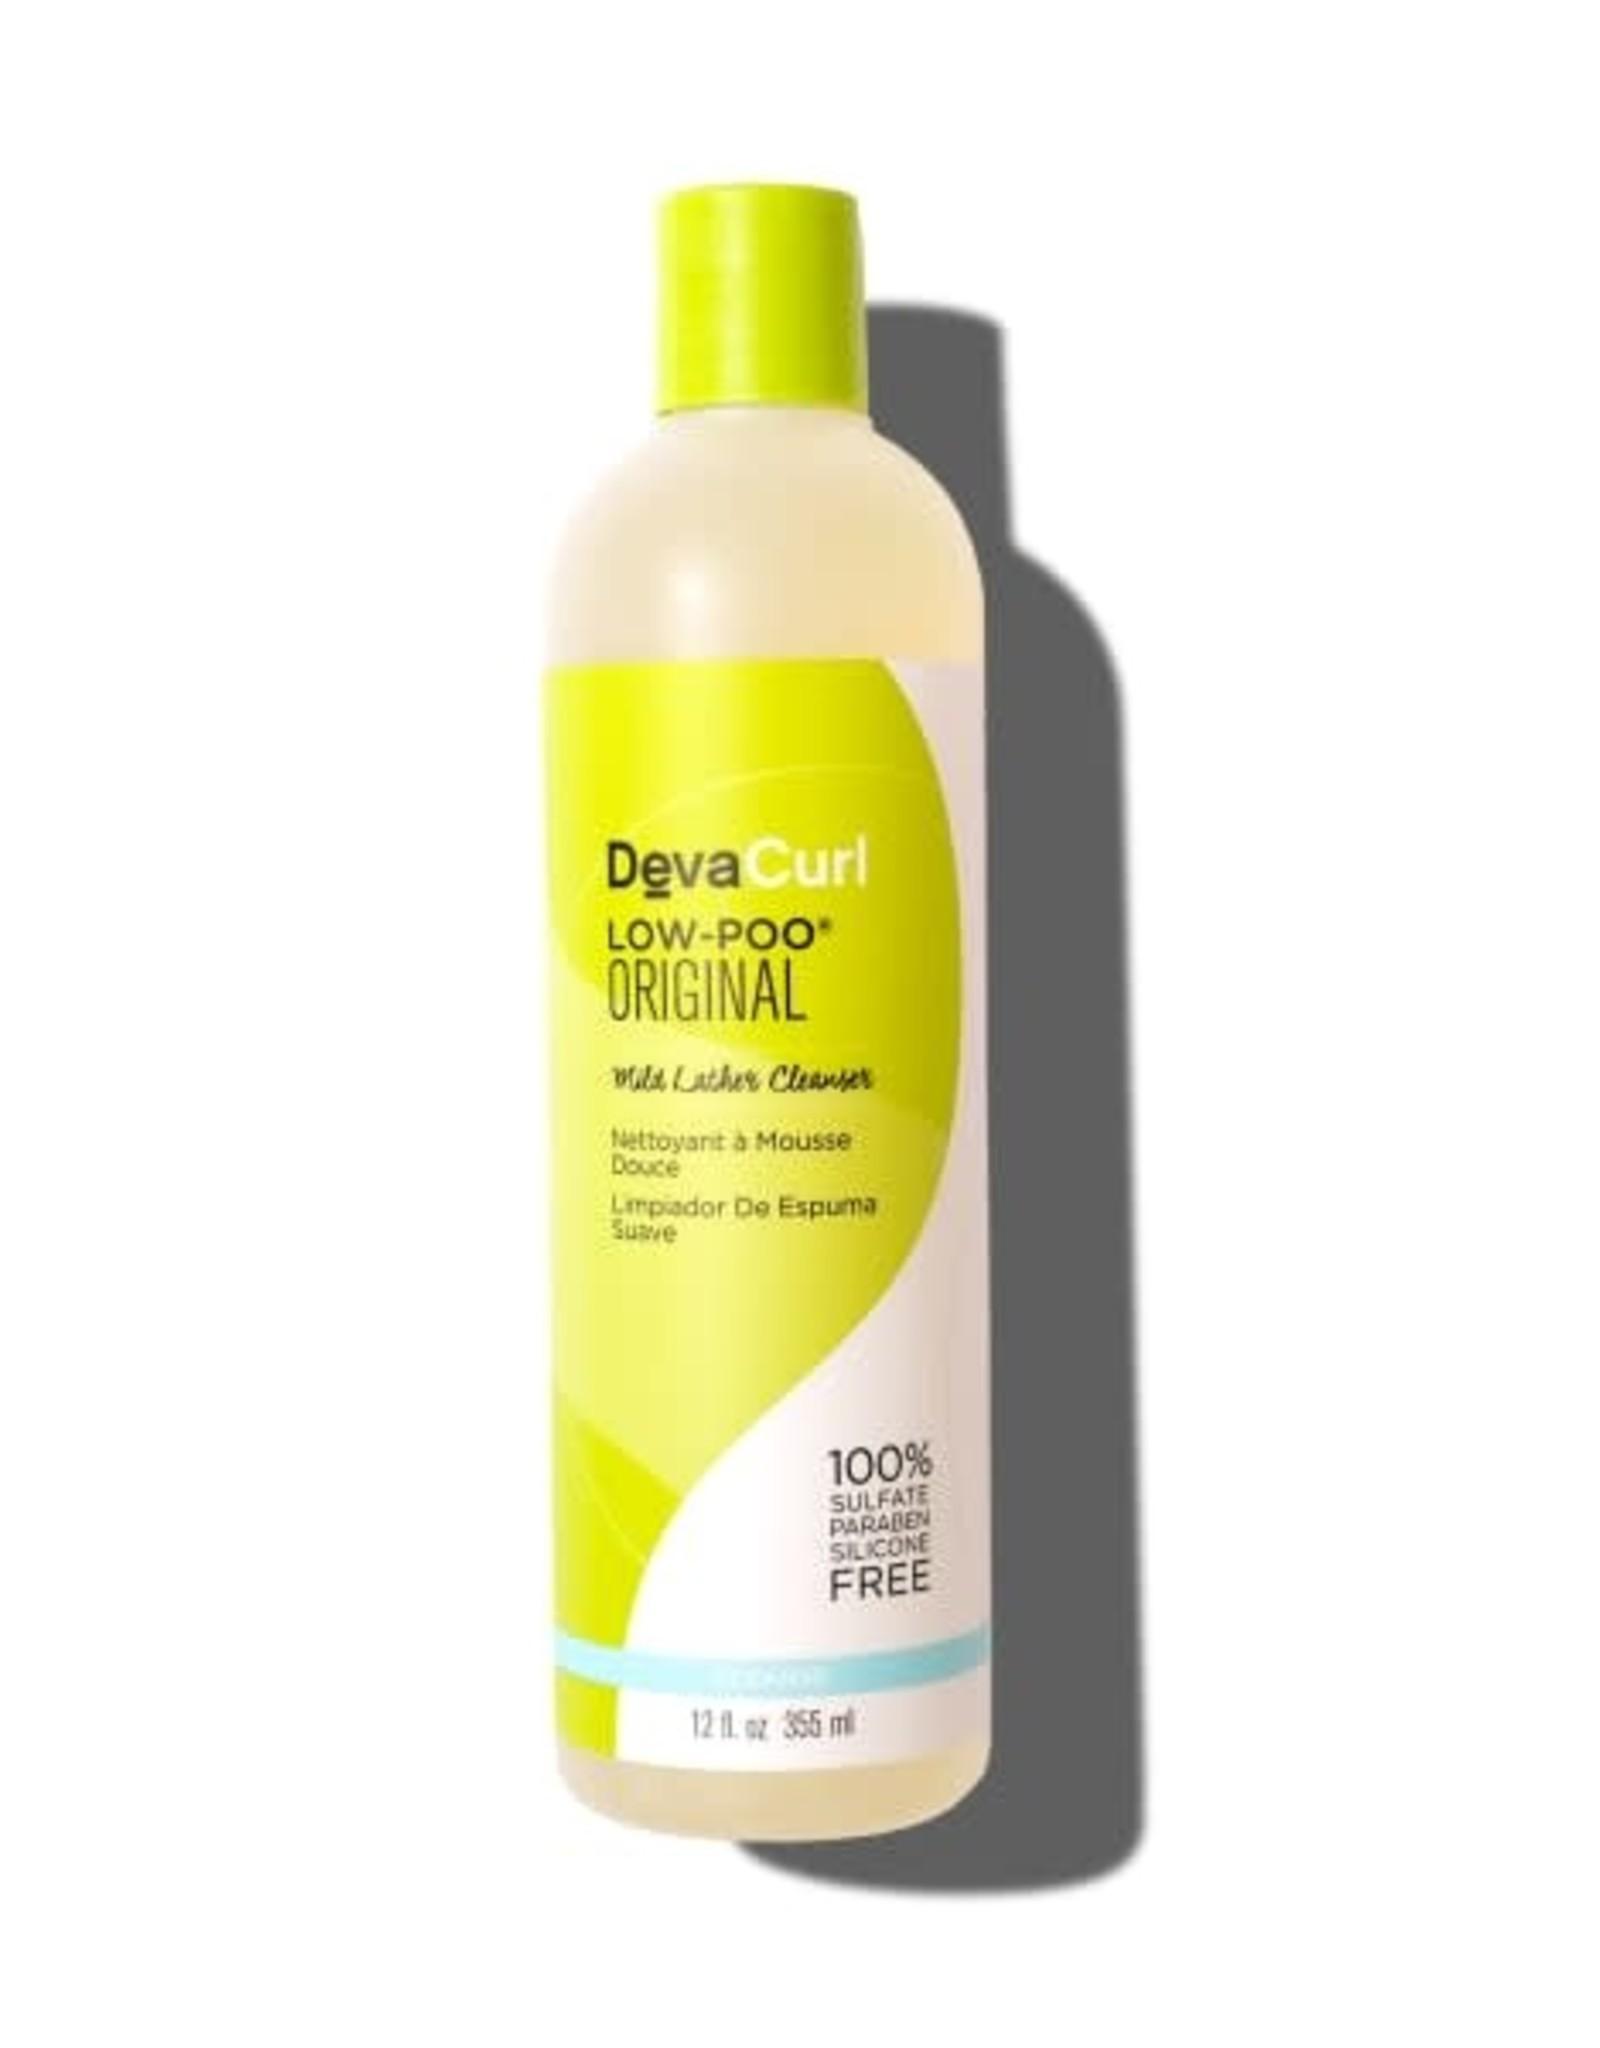 DevaCurl Low-Poo Shampoo